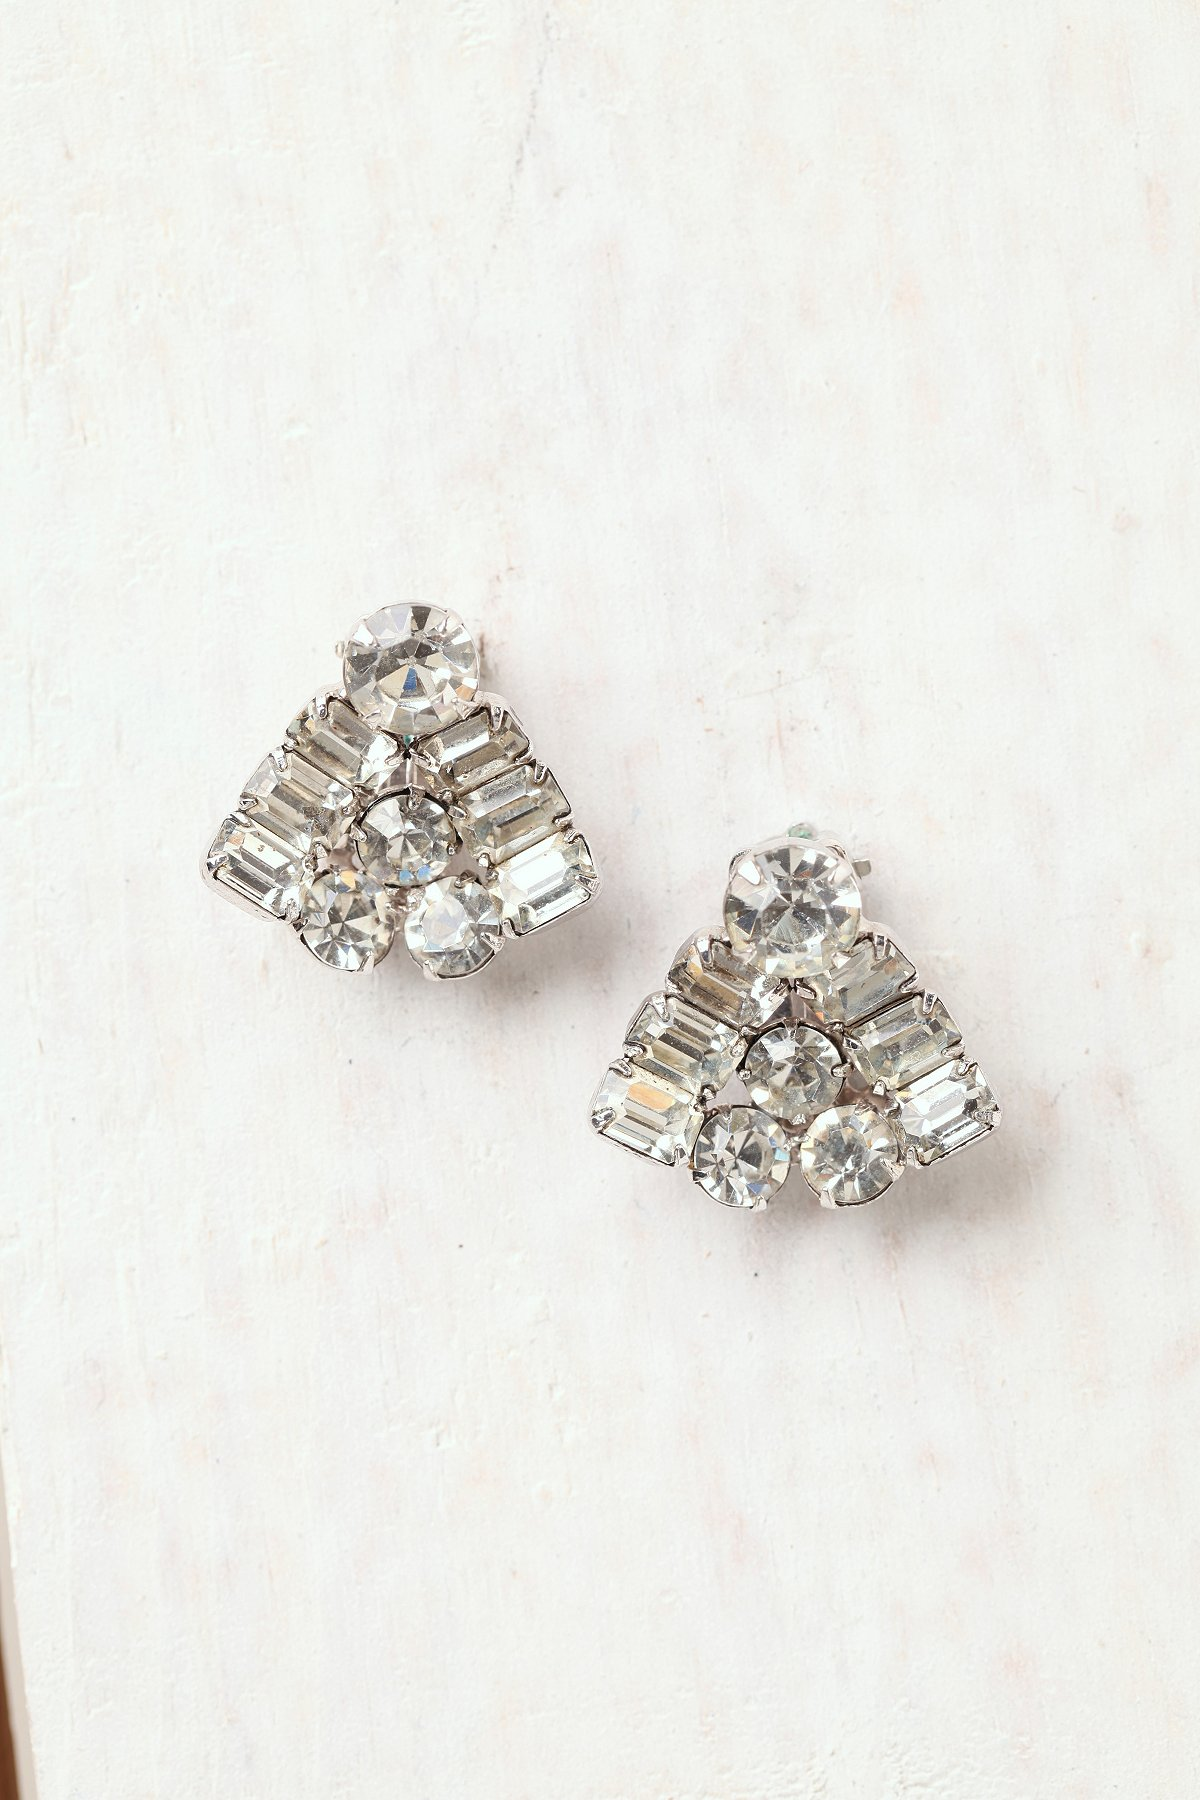 Vintage Rhinestone Triangle Earrings